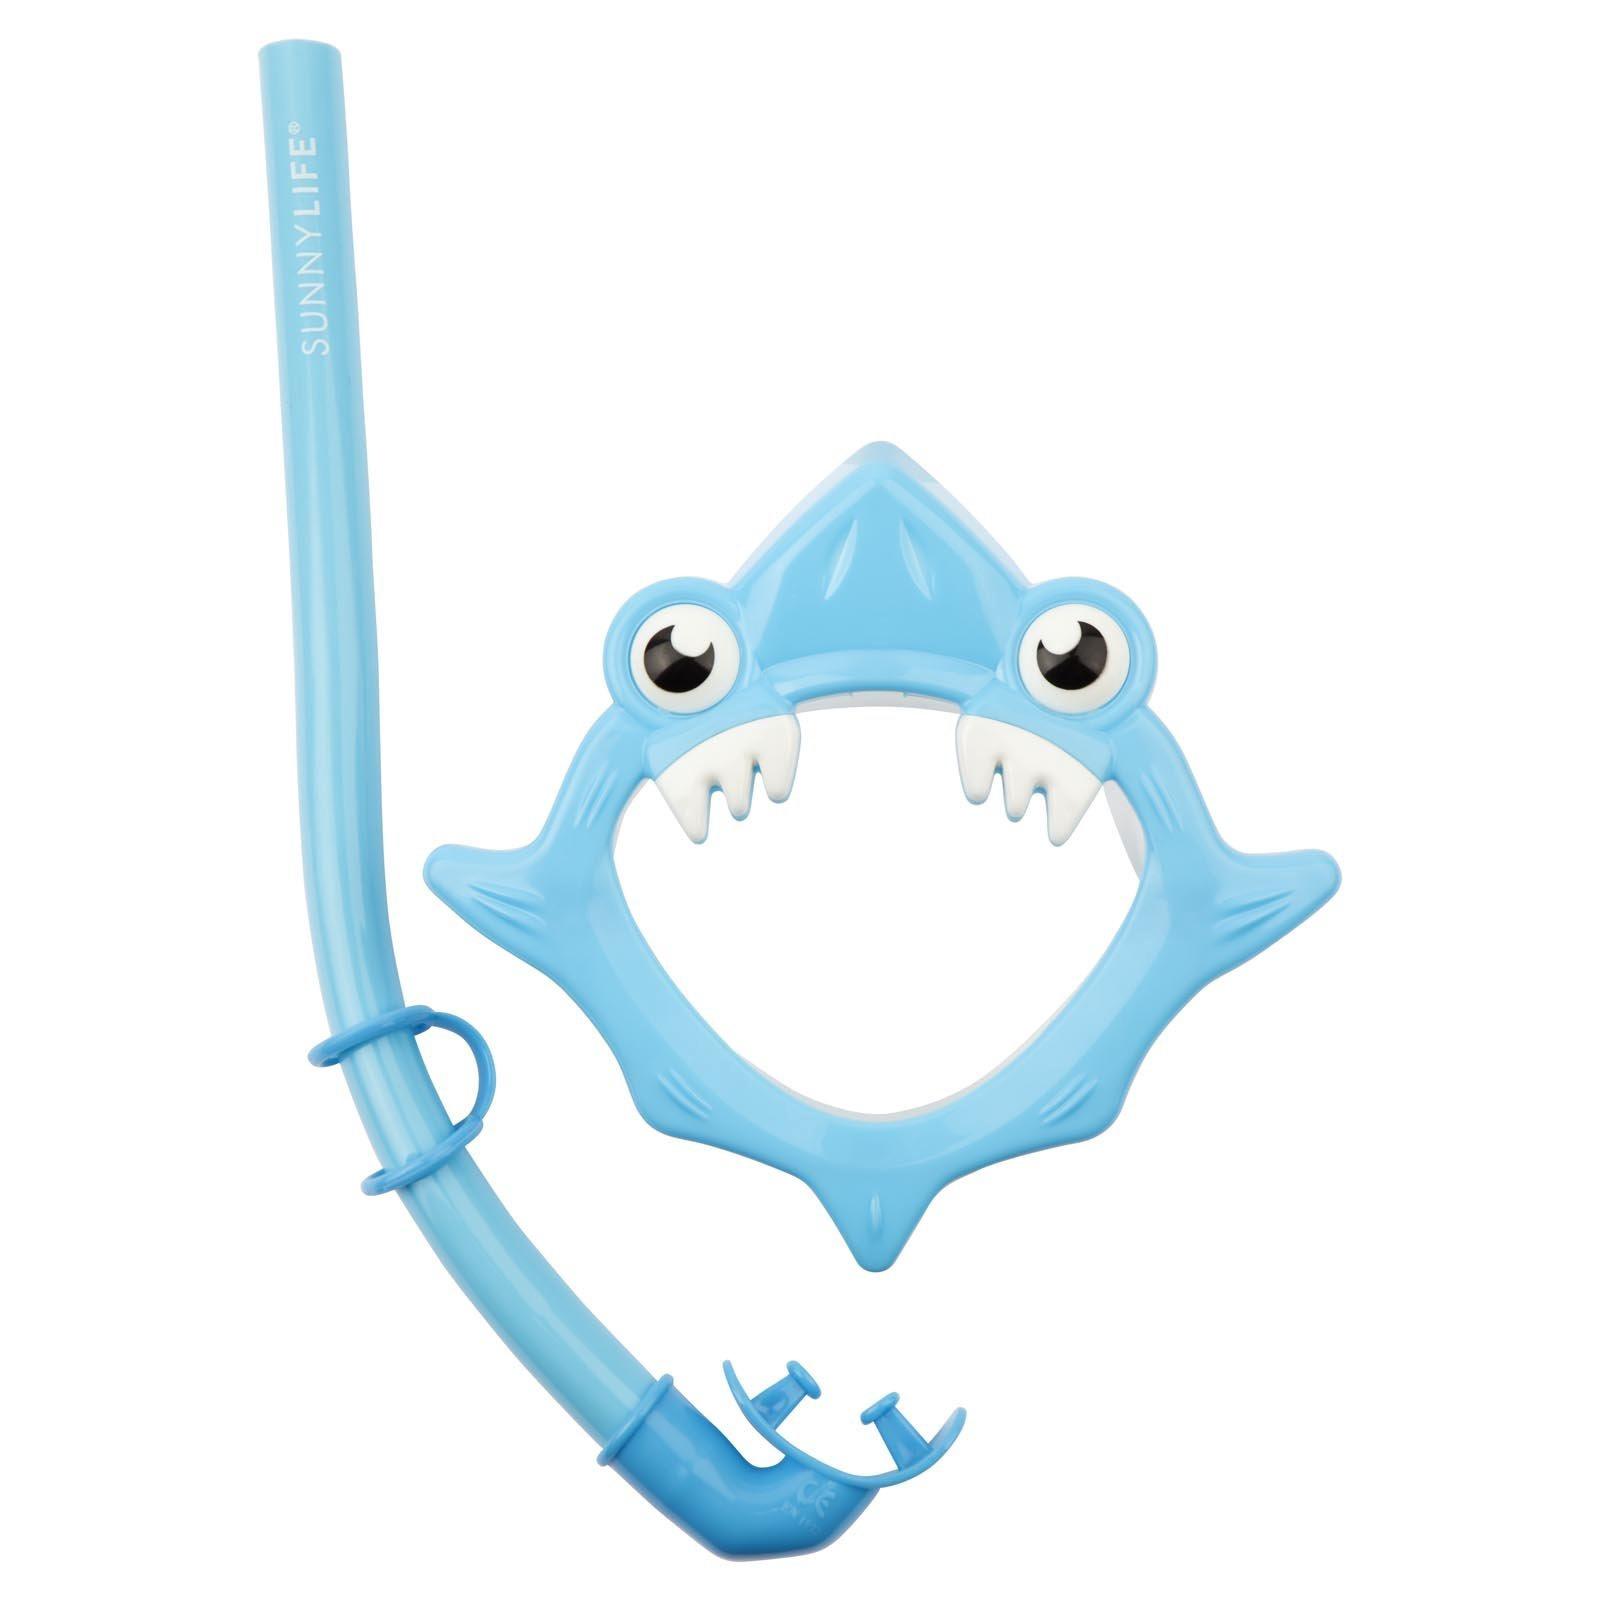 Sunny Life Shark Snorkeling Set